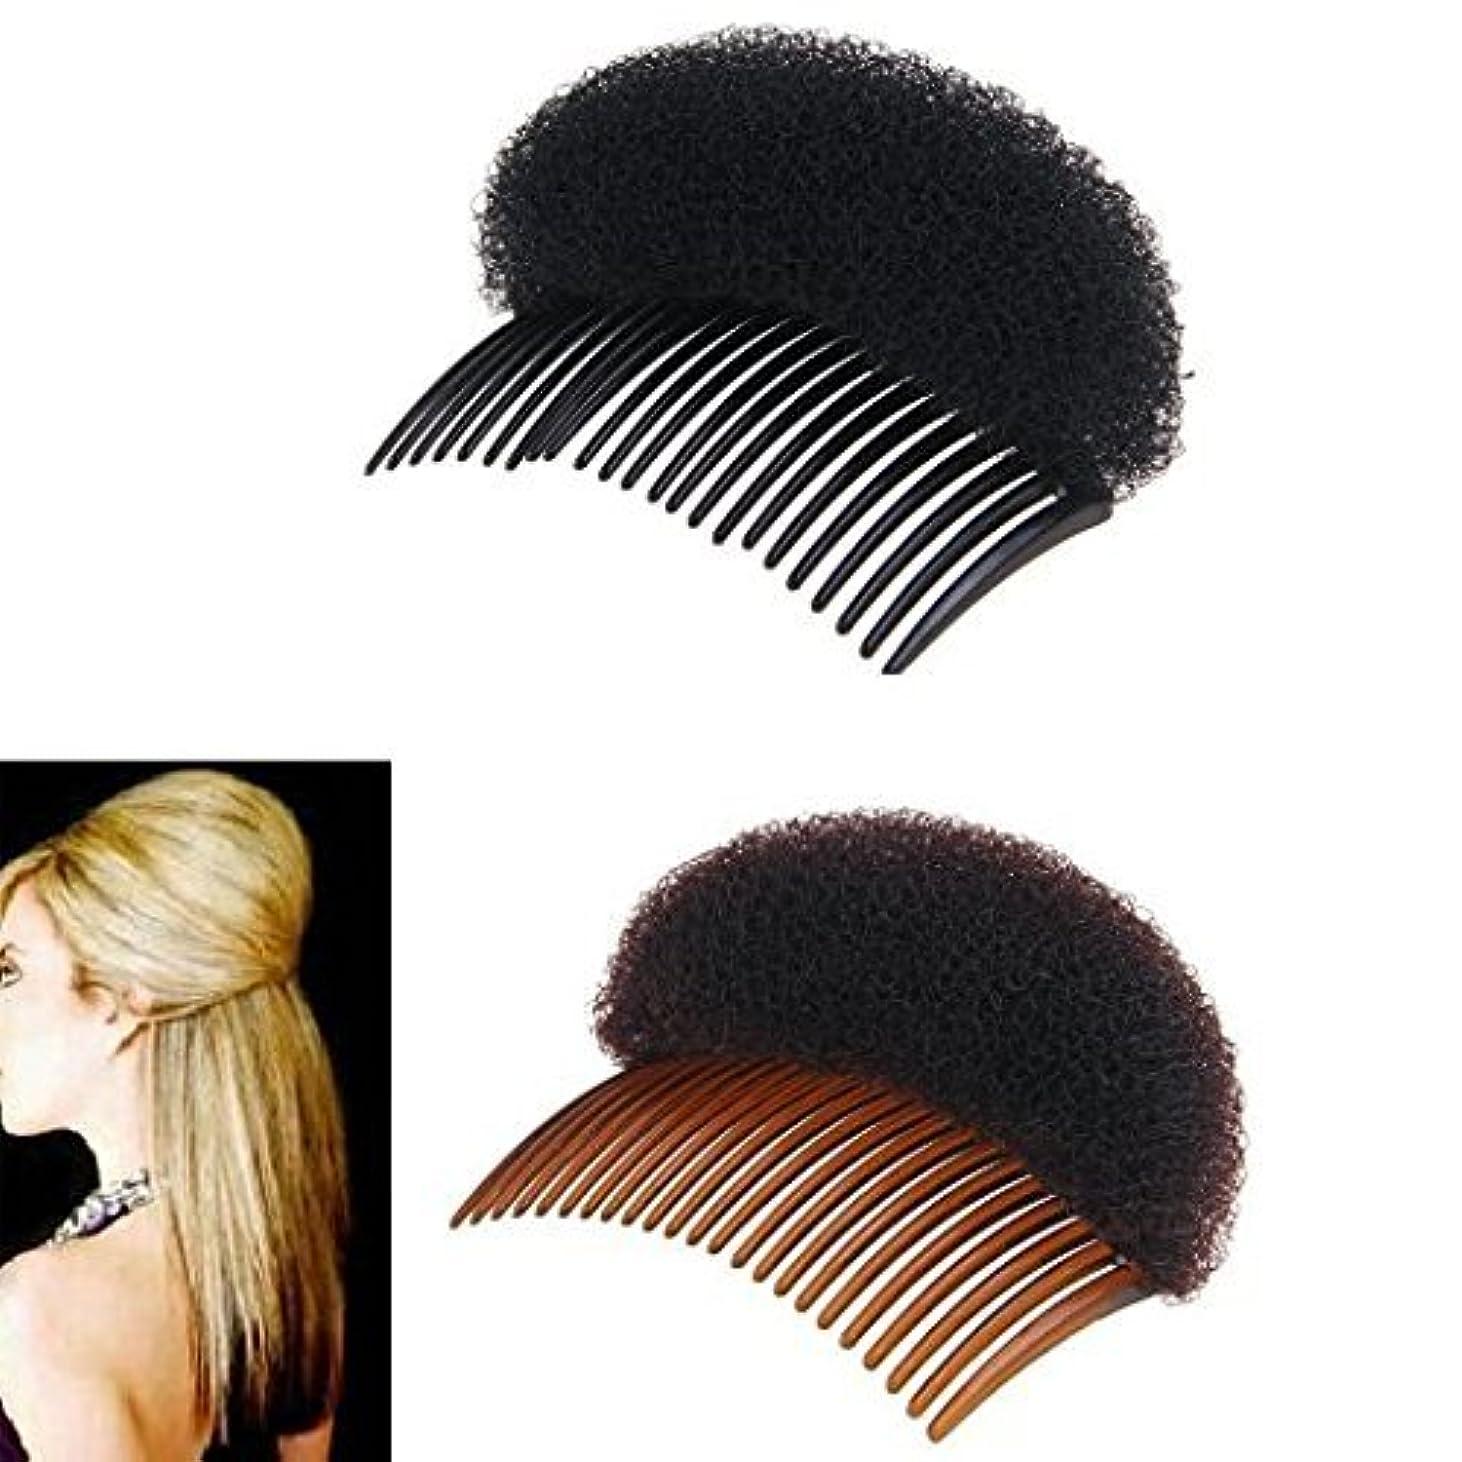 安全性魔術規則性2Pices(1Black+1Brown) Women Bump It Up Volume Hair Base Styling Clip Stick Bum Maker Braid Insert Tool Do Beehive...